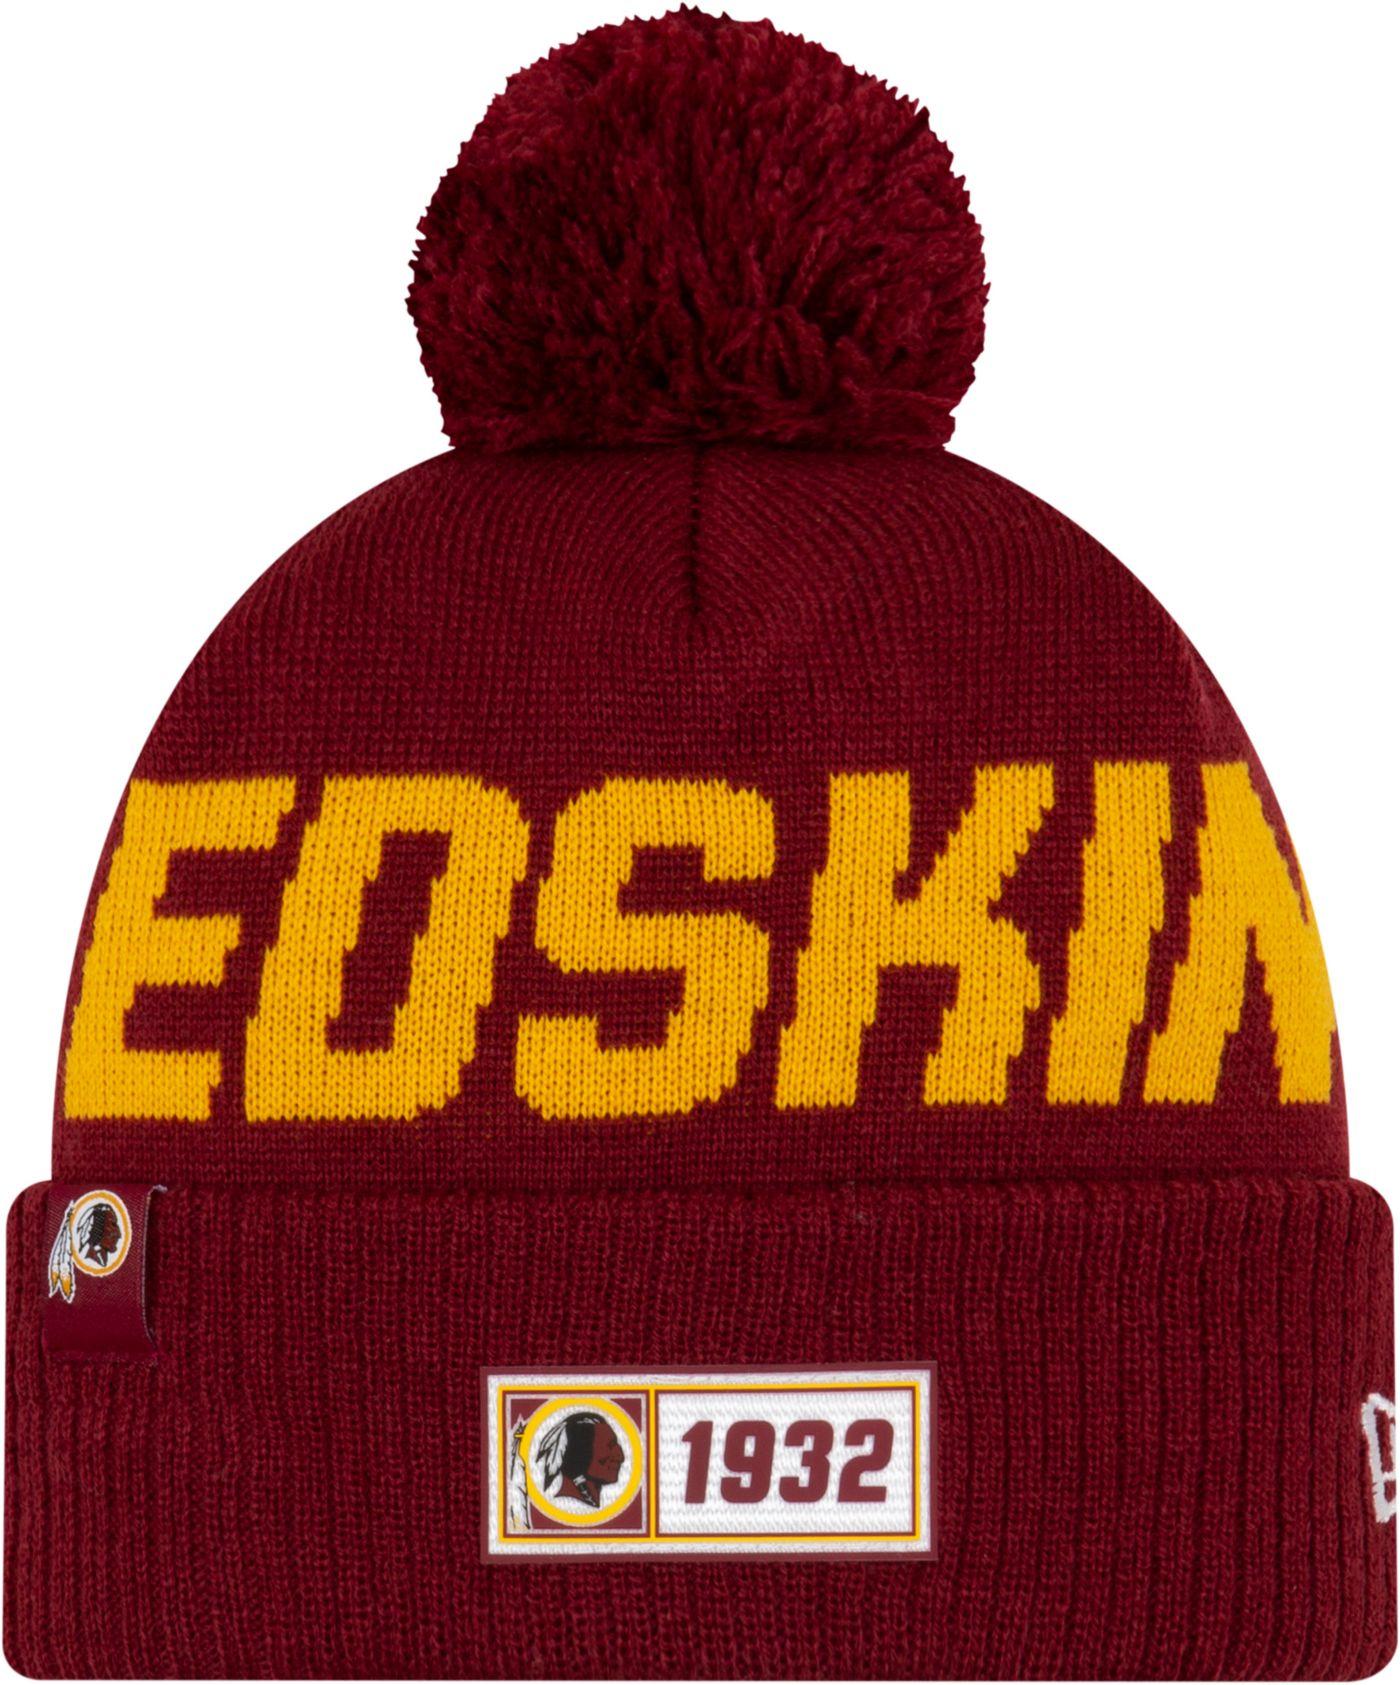 New Era Men's Washington Redskins Sideline Road Sport Pom Knit